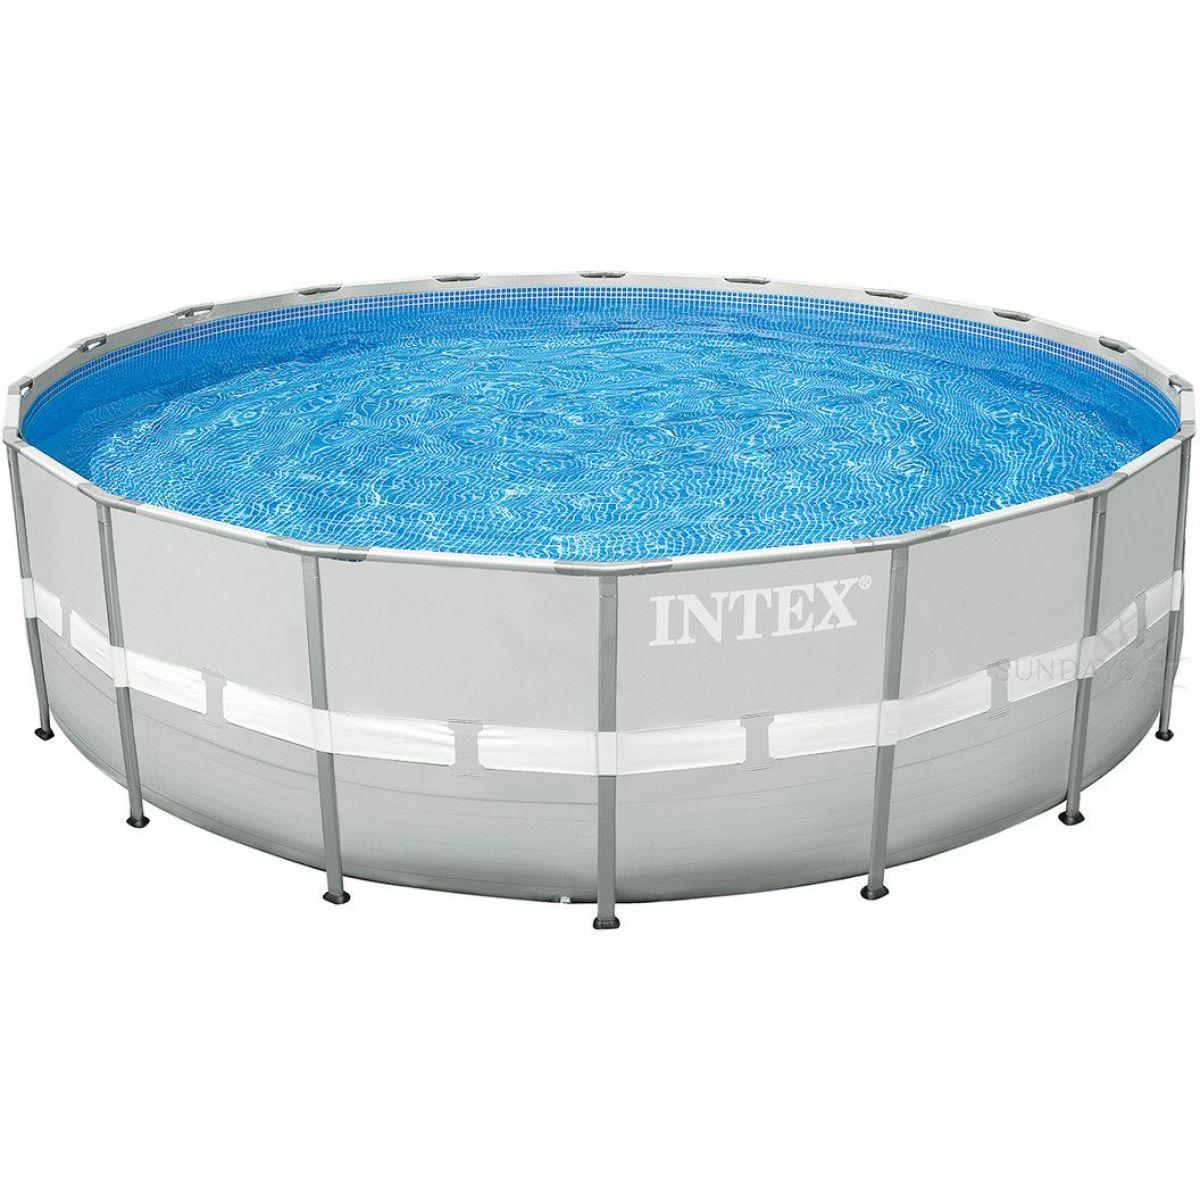 Intex 28328 Bazén s tvrzeným rámem 488x122cm